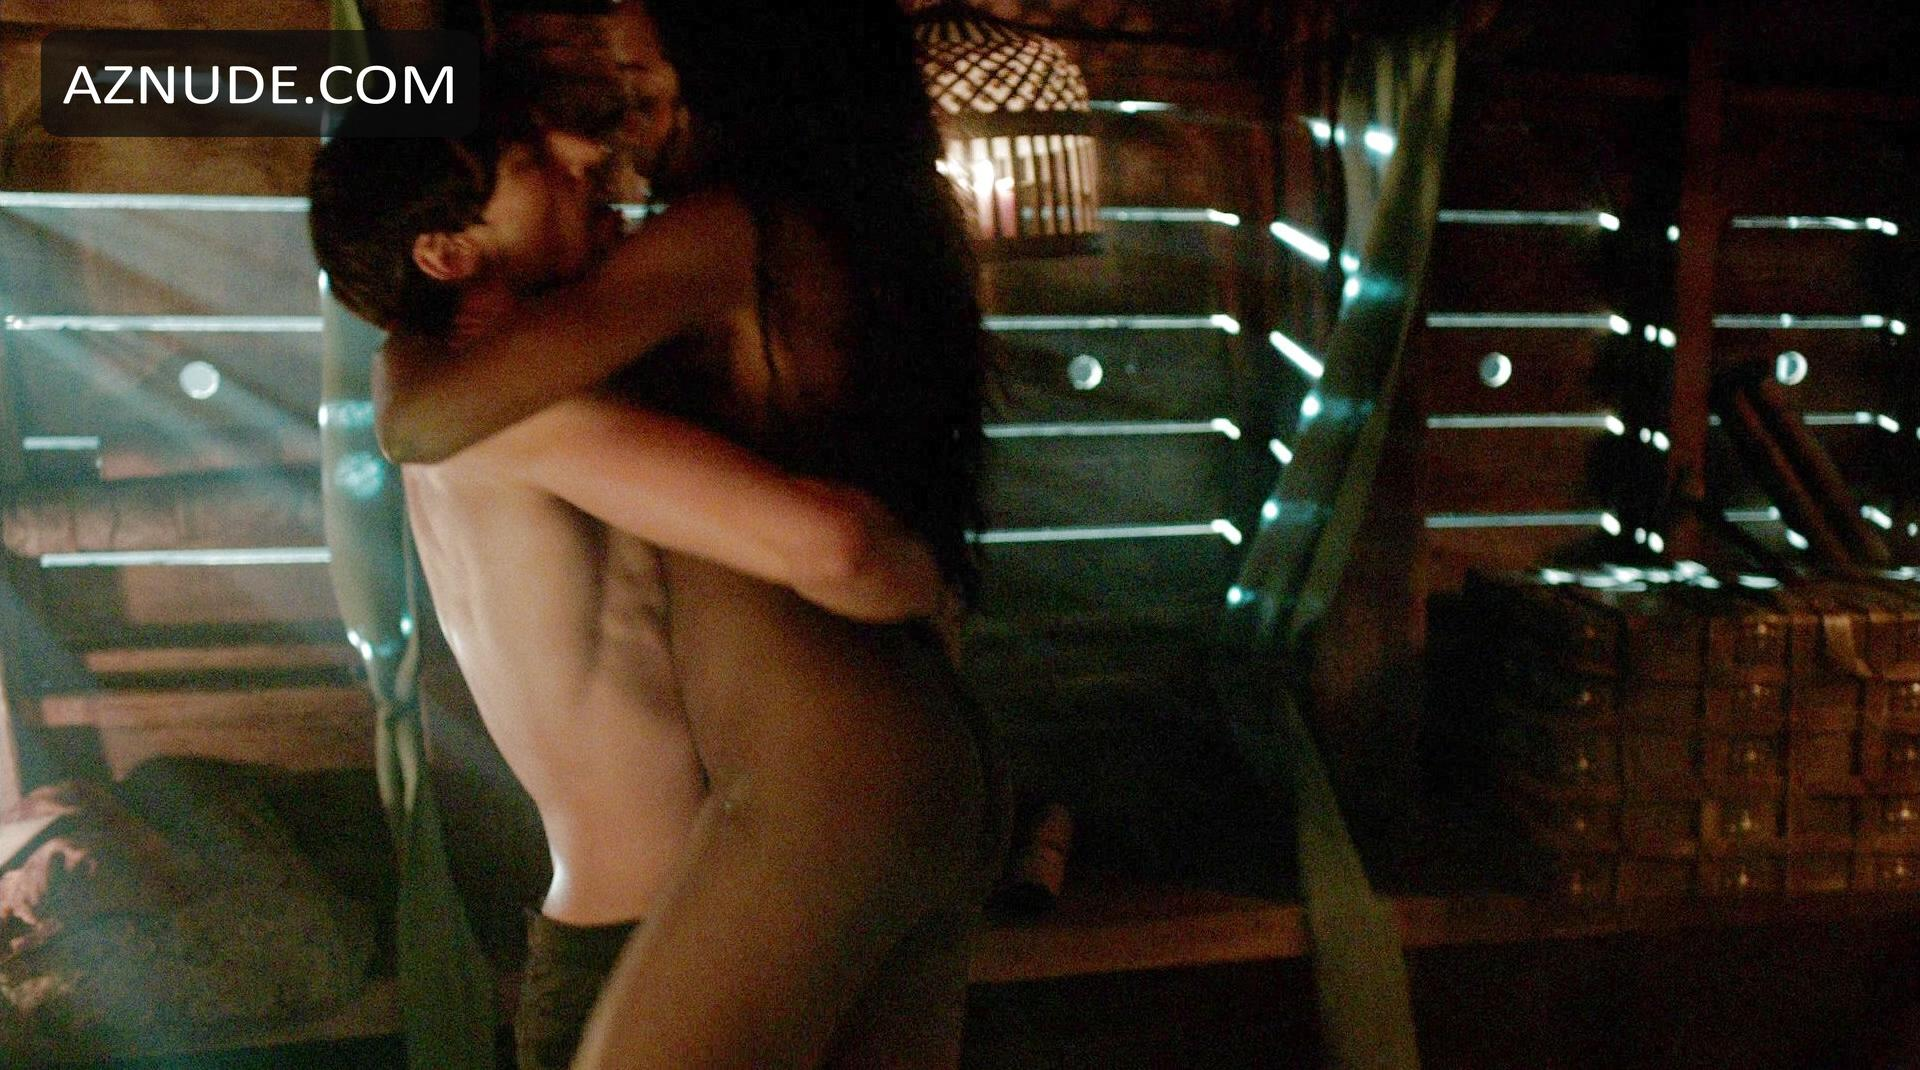 Kristen stewart nude sex scene in on the road scandalplanet - 1 part 9